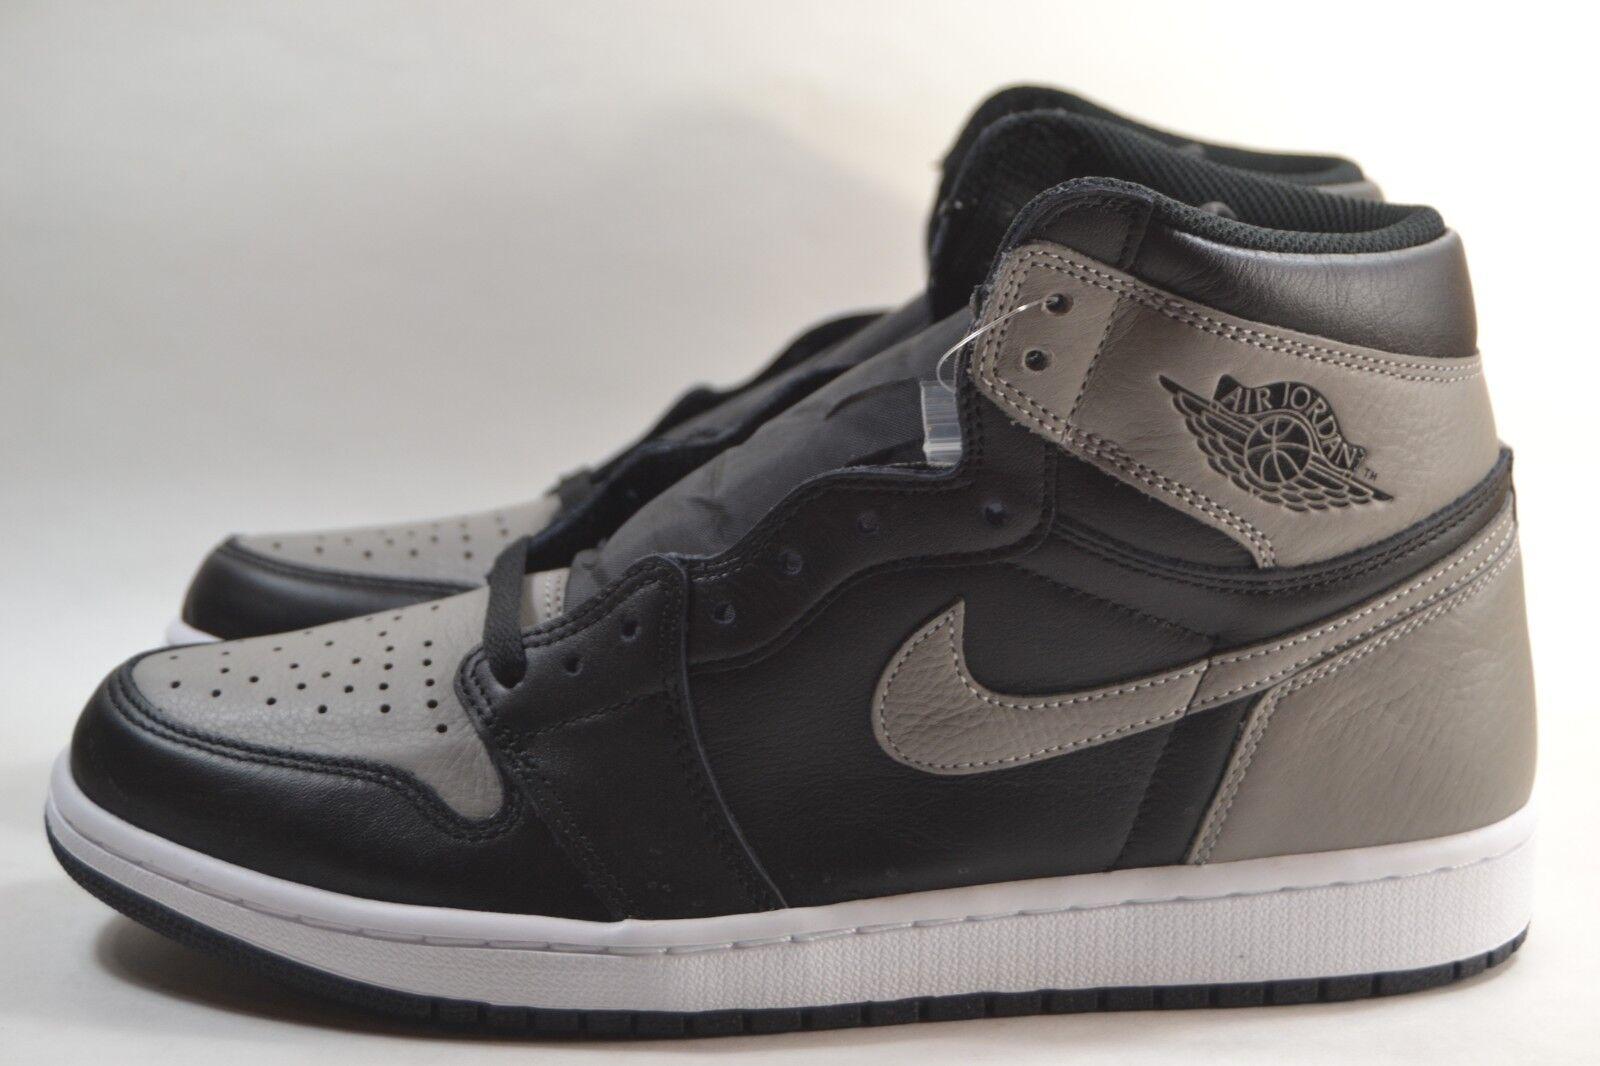 New Nike Air Jordan 1 Retro High OG  Shadow Grey Black White 555088-013